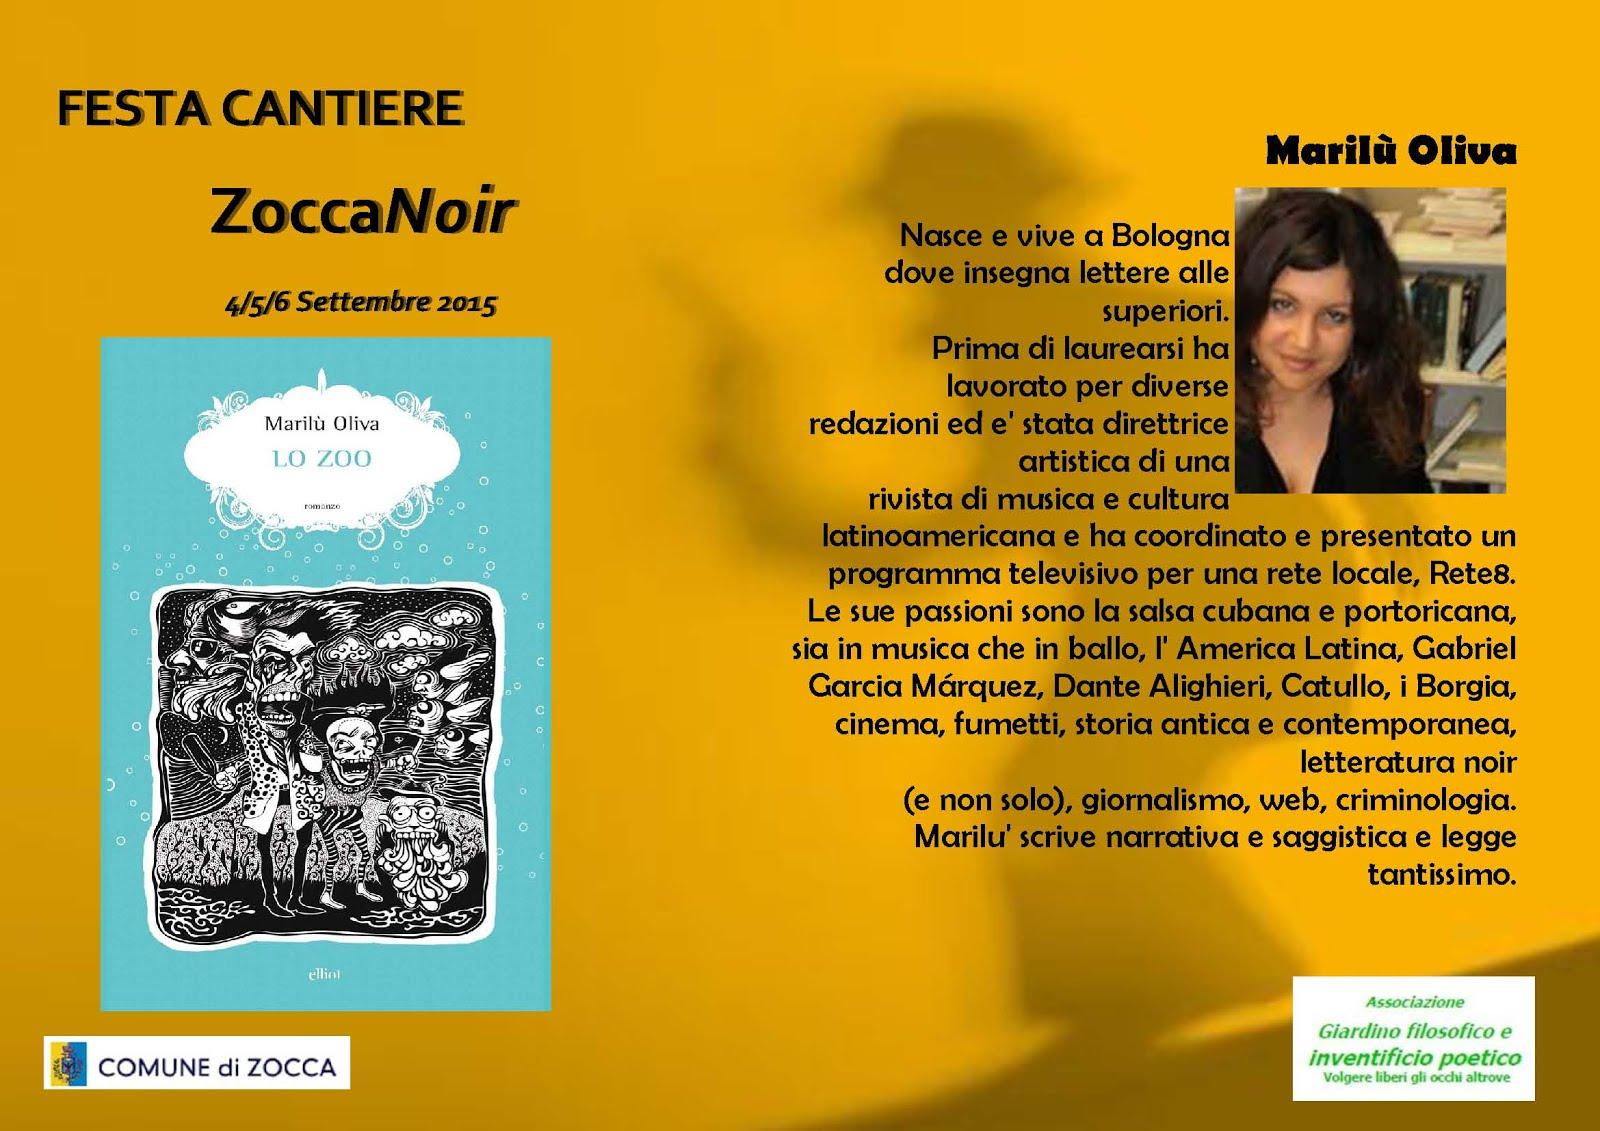 Biografia Marilù Oliva